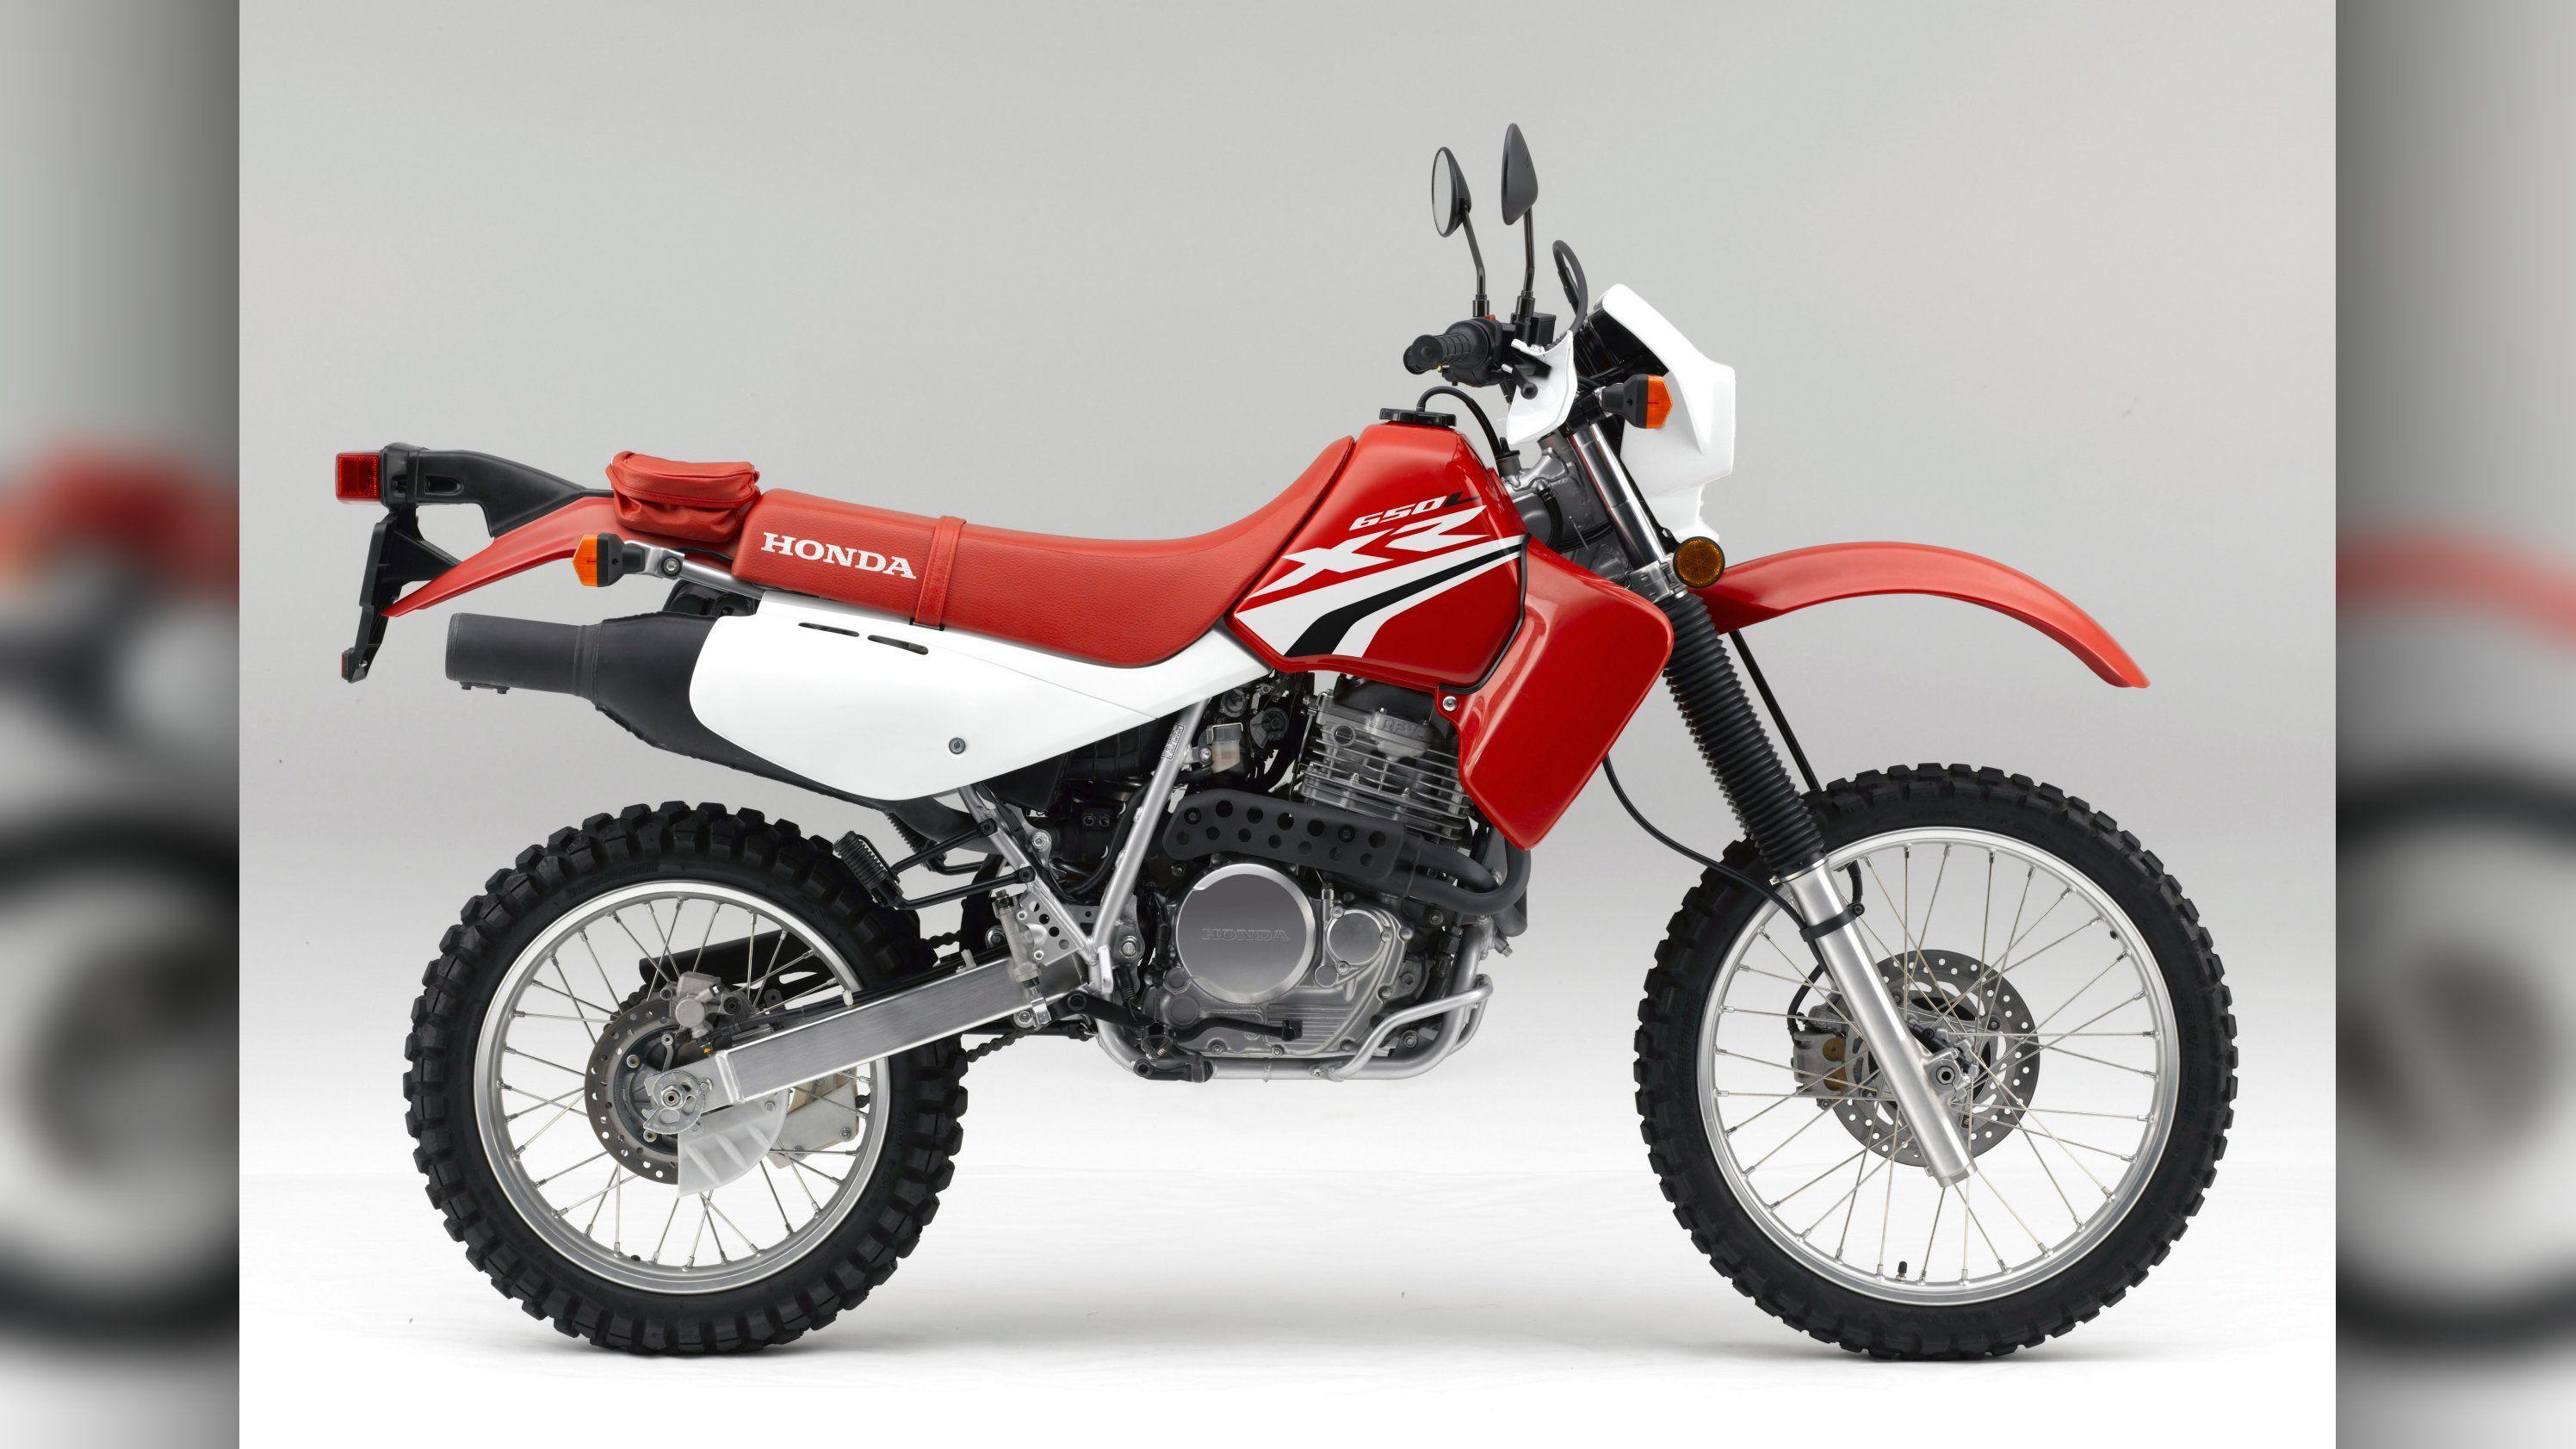 2020 Honda Xr650l Wallpaper Dual Sport Honda Motorcycle Model